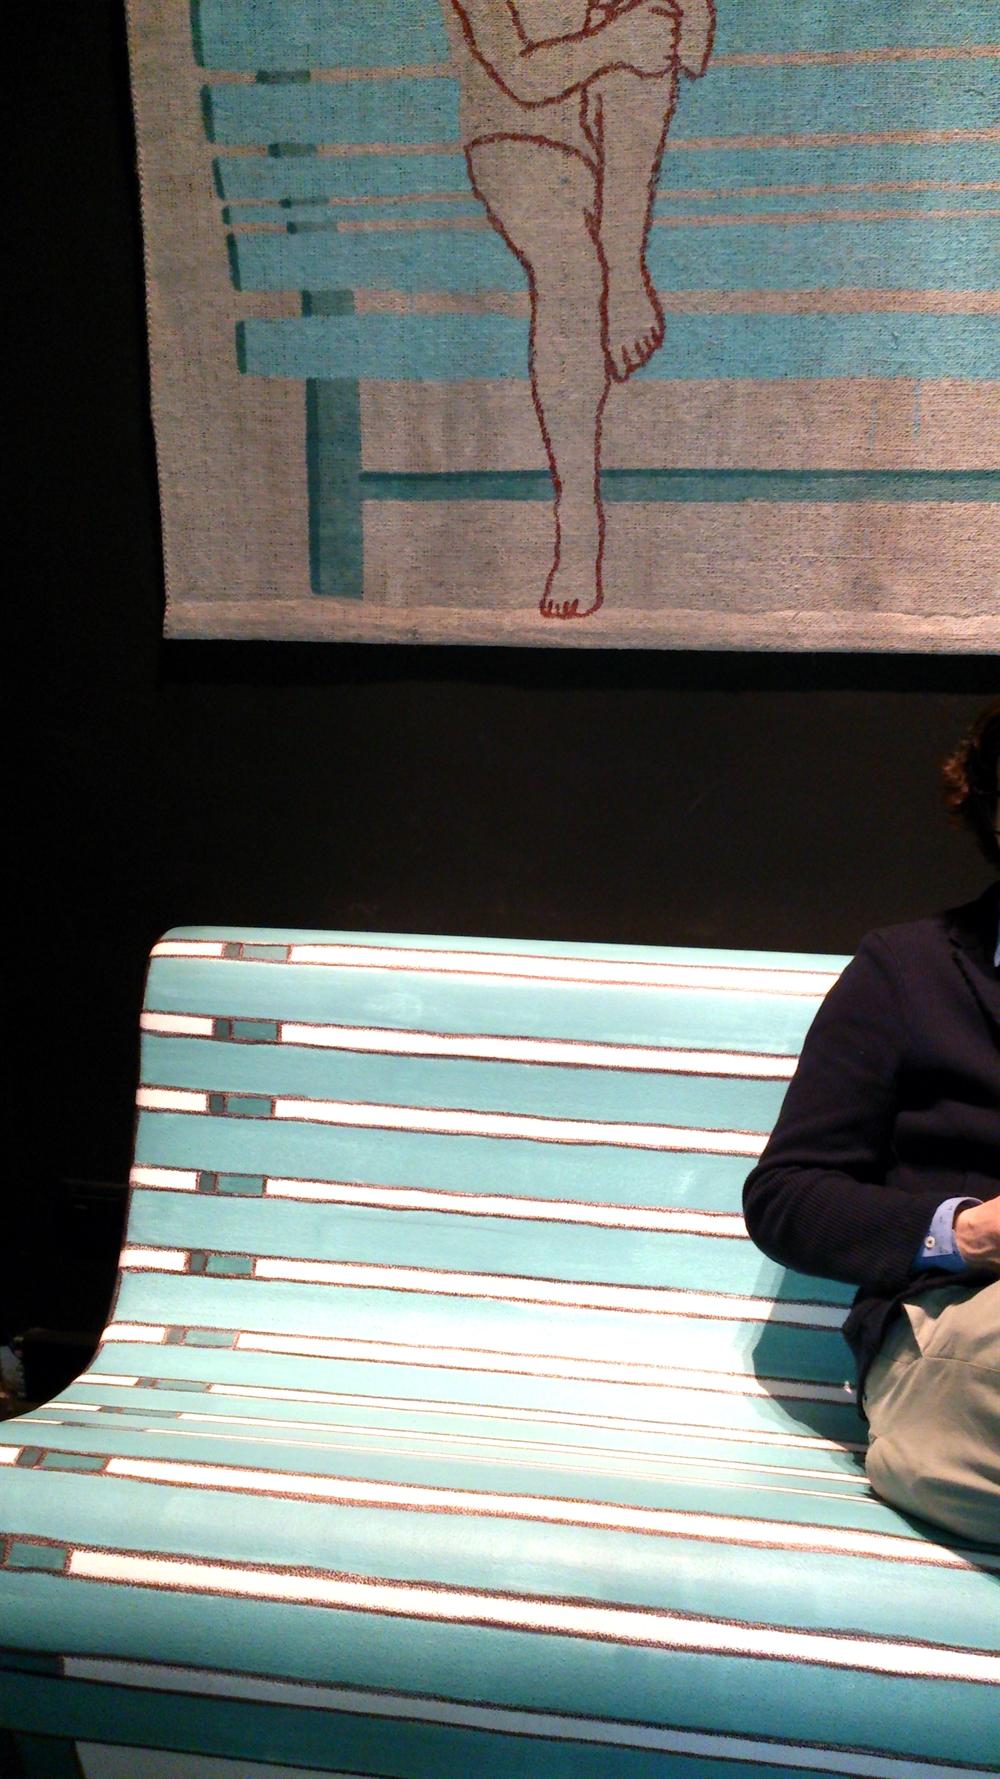 18 fuorisalone milan design week 2015 rossana orlandi nika zupanc gufram marimekko scarlet splendour interior design luxurious furniture meble luksusowe projektowanie marcel wanders